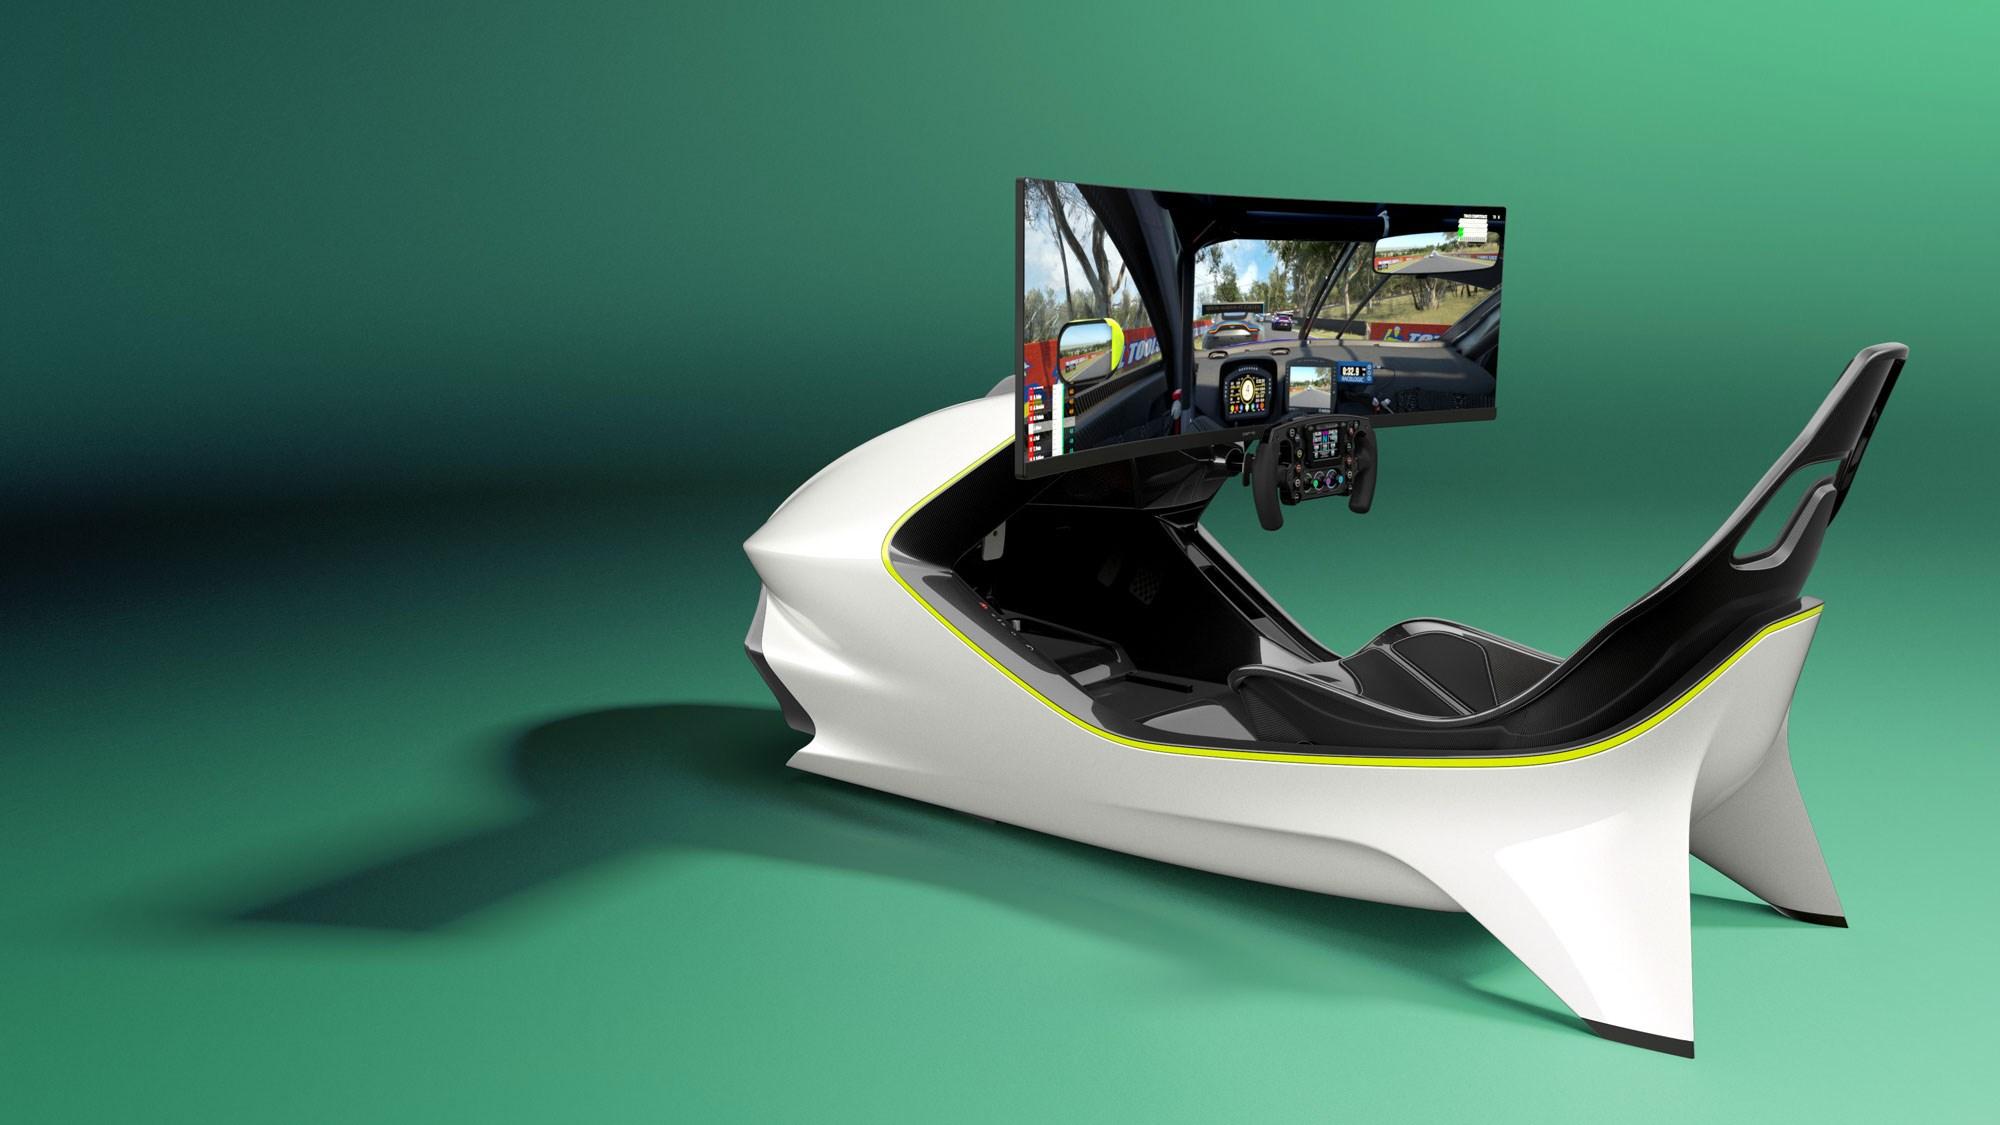 Aston Martin AMR-C01 is a £57500 luxury racing simulator